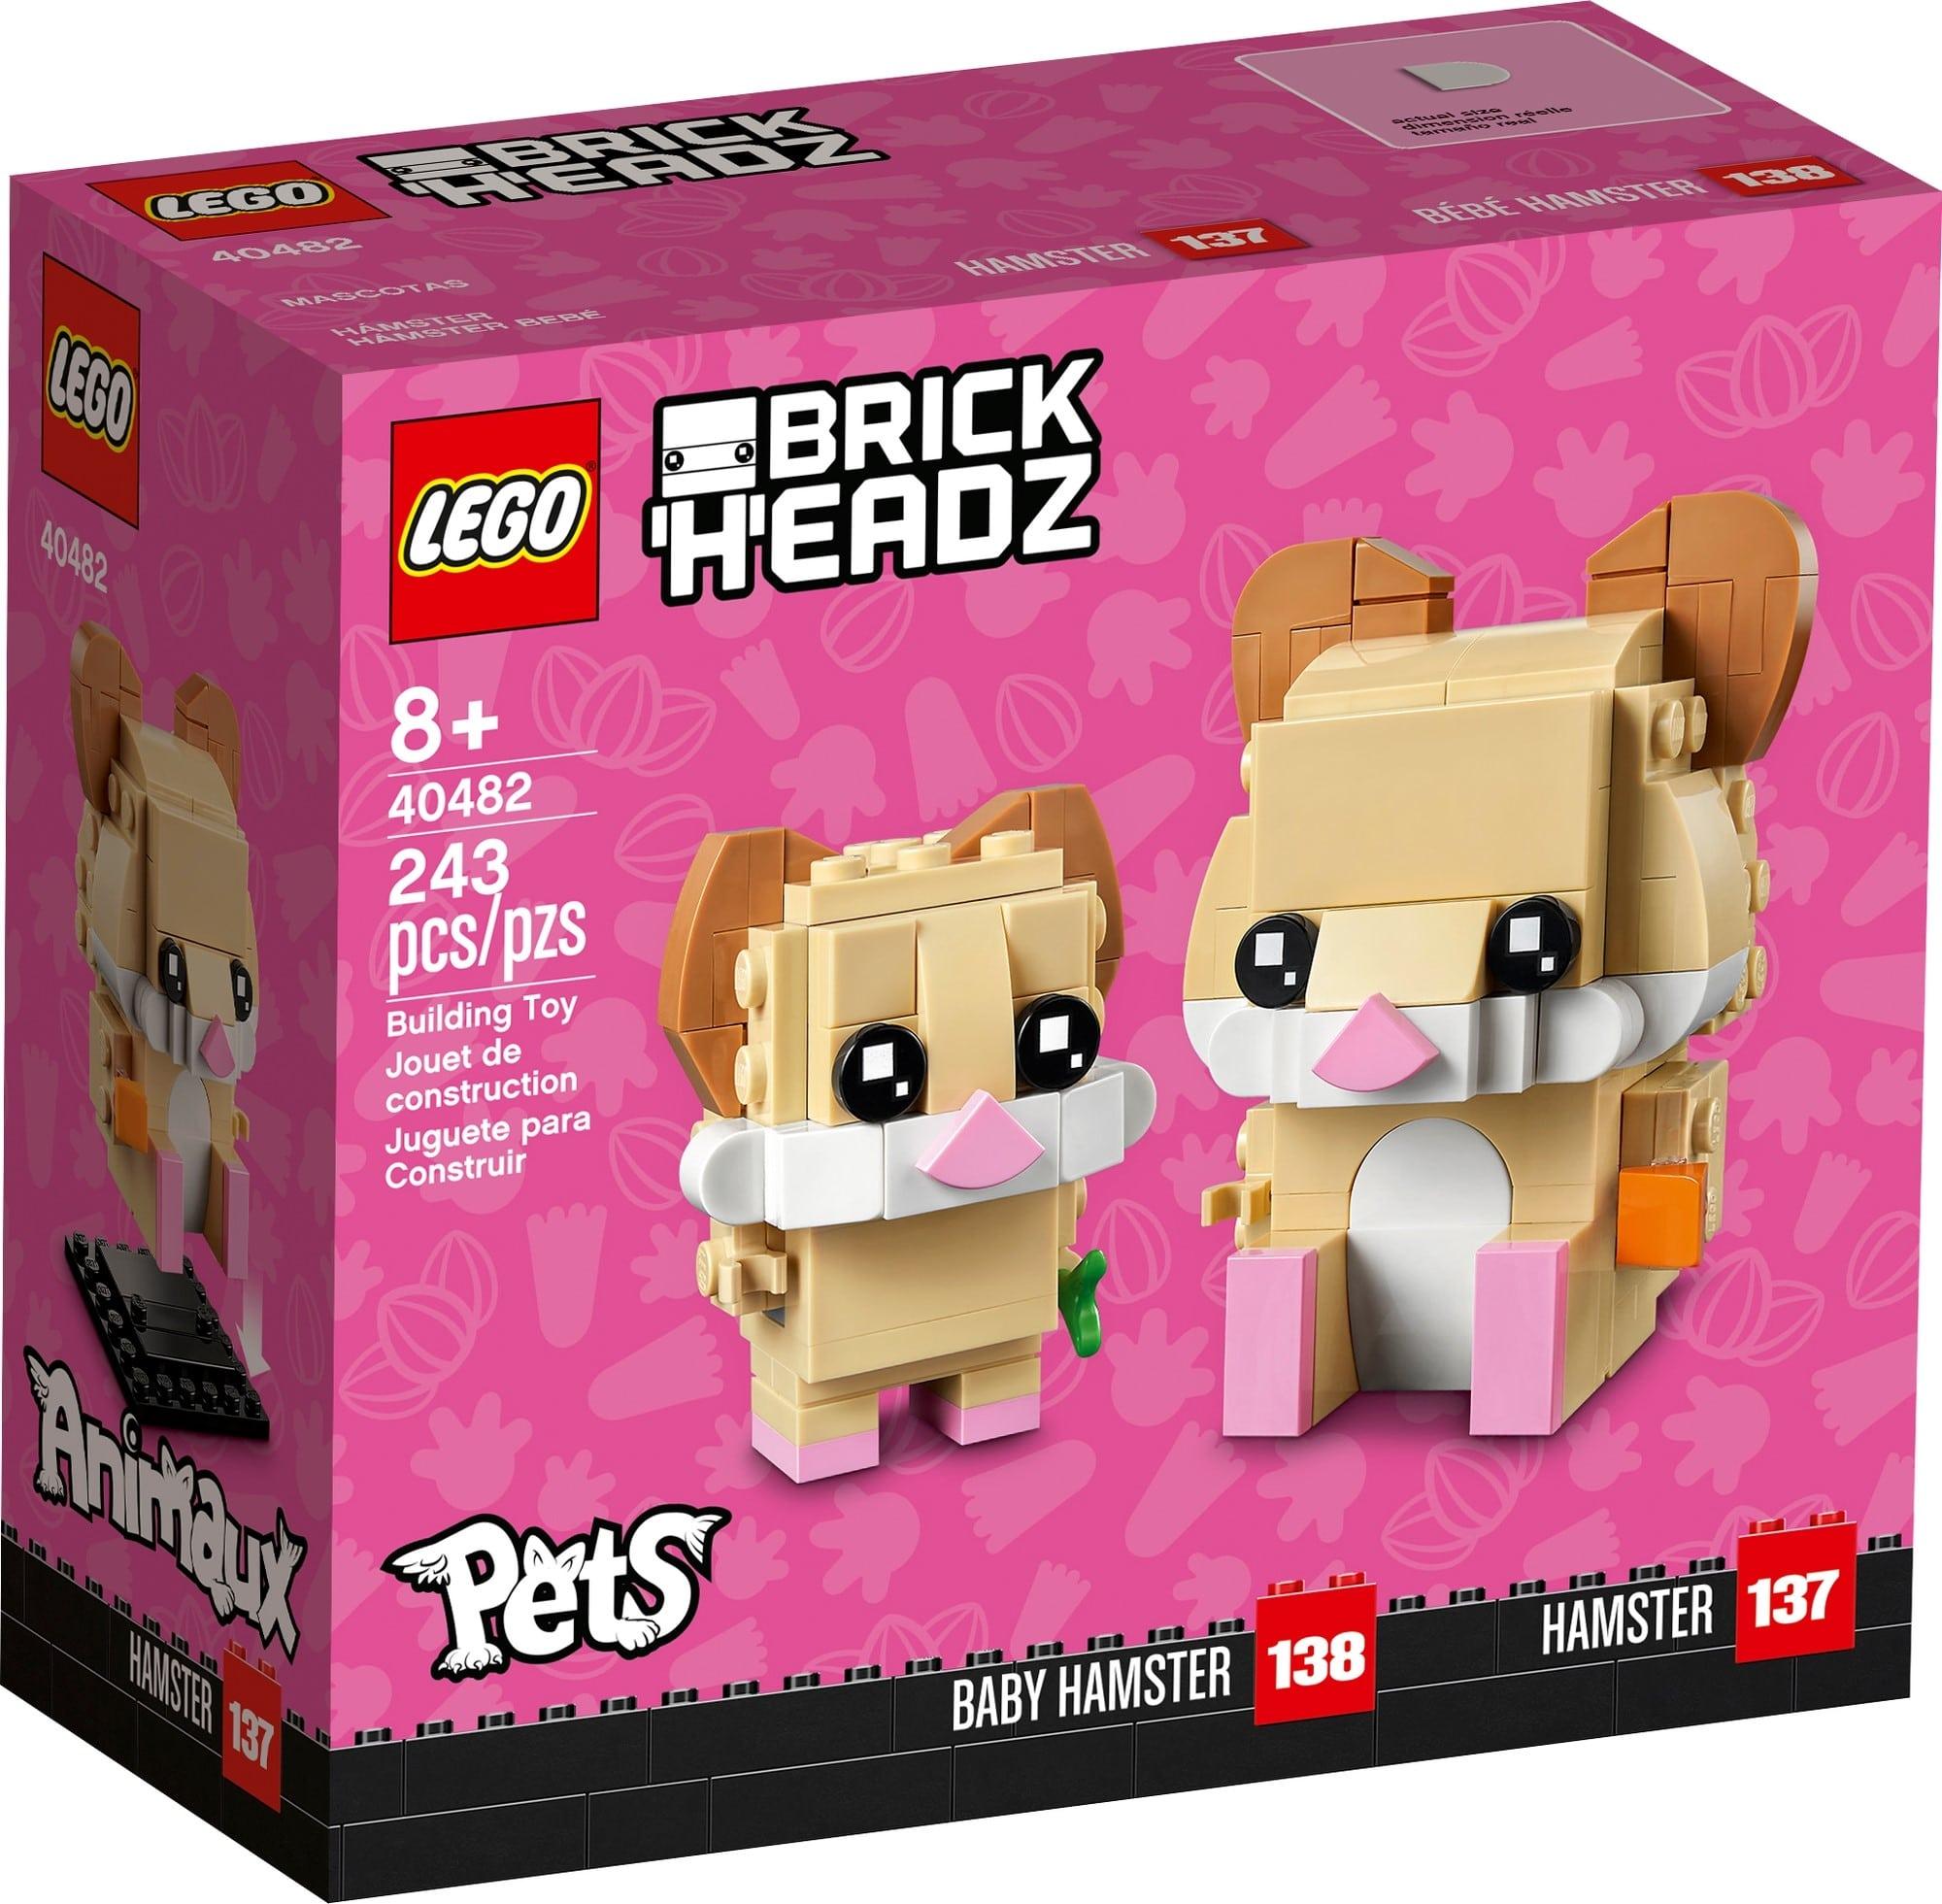 LEGO Brickheadz 40482 Hamster 2